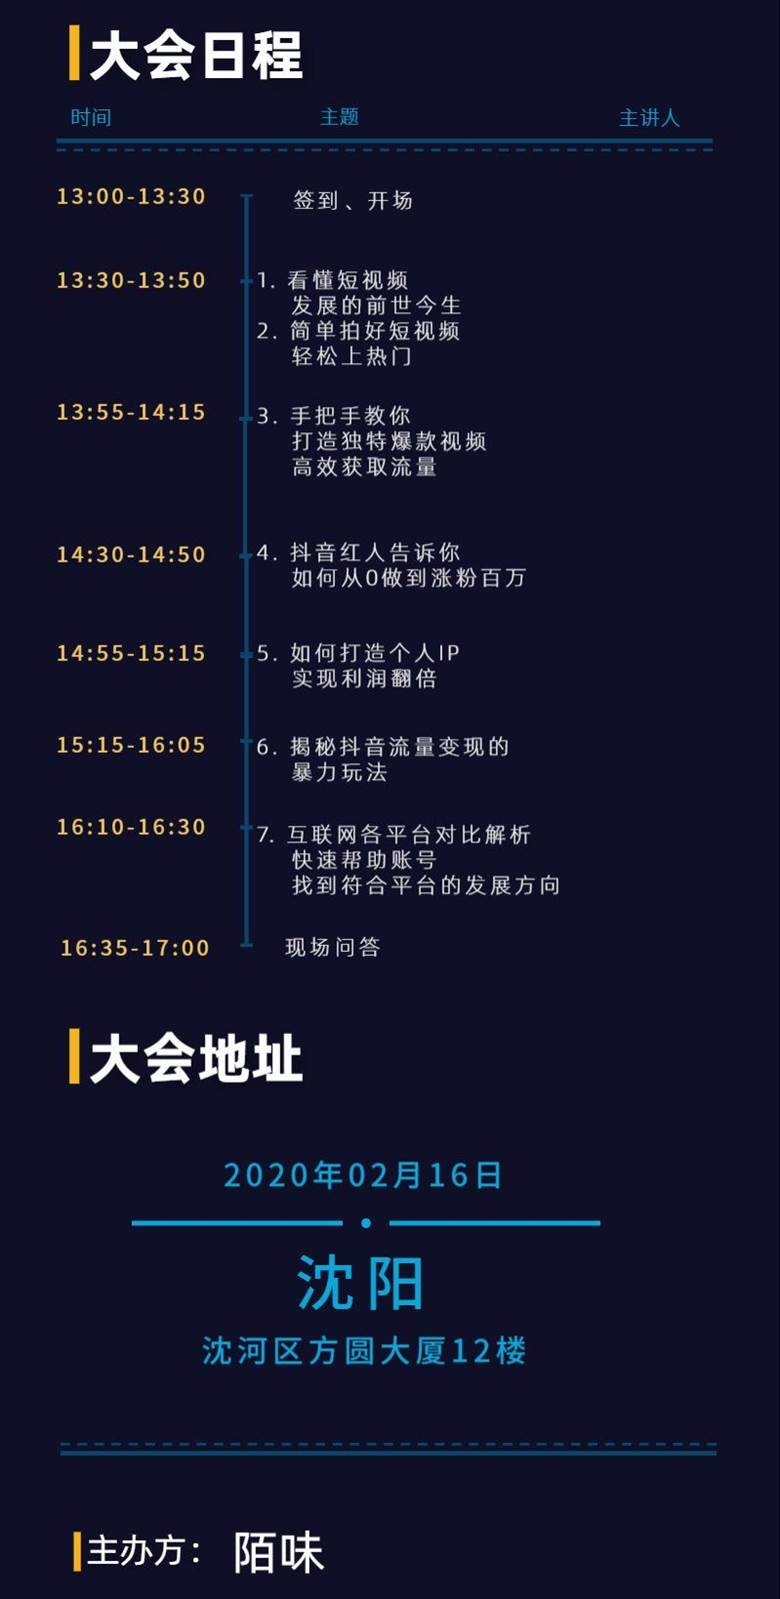 活动_万能看图王_万能看图王.png